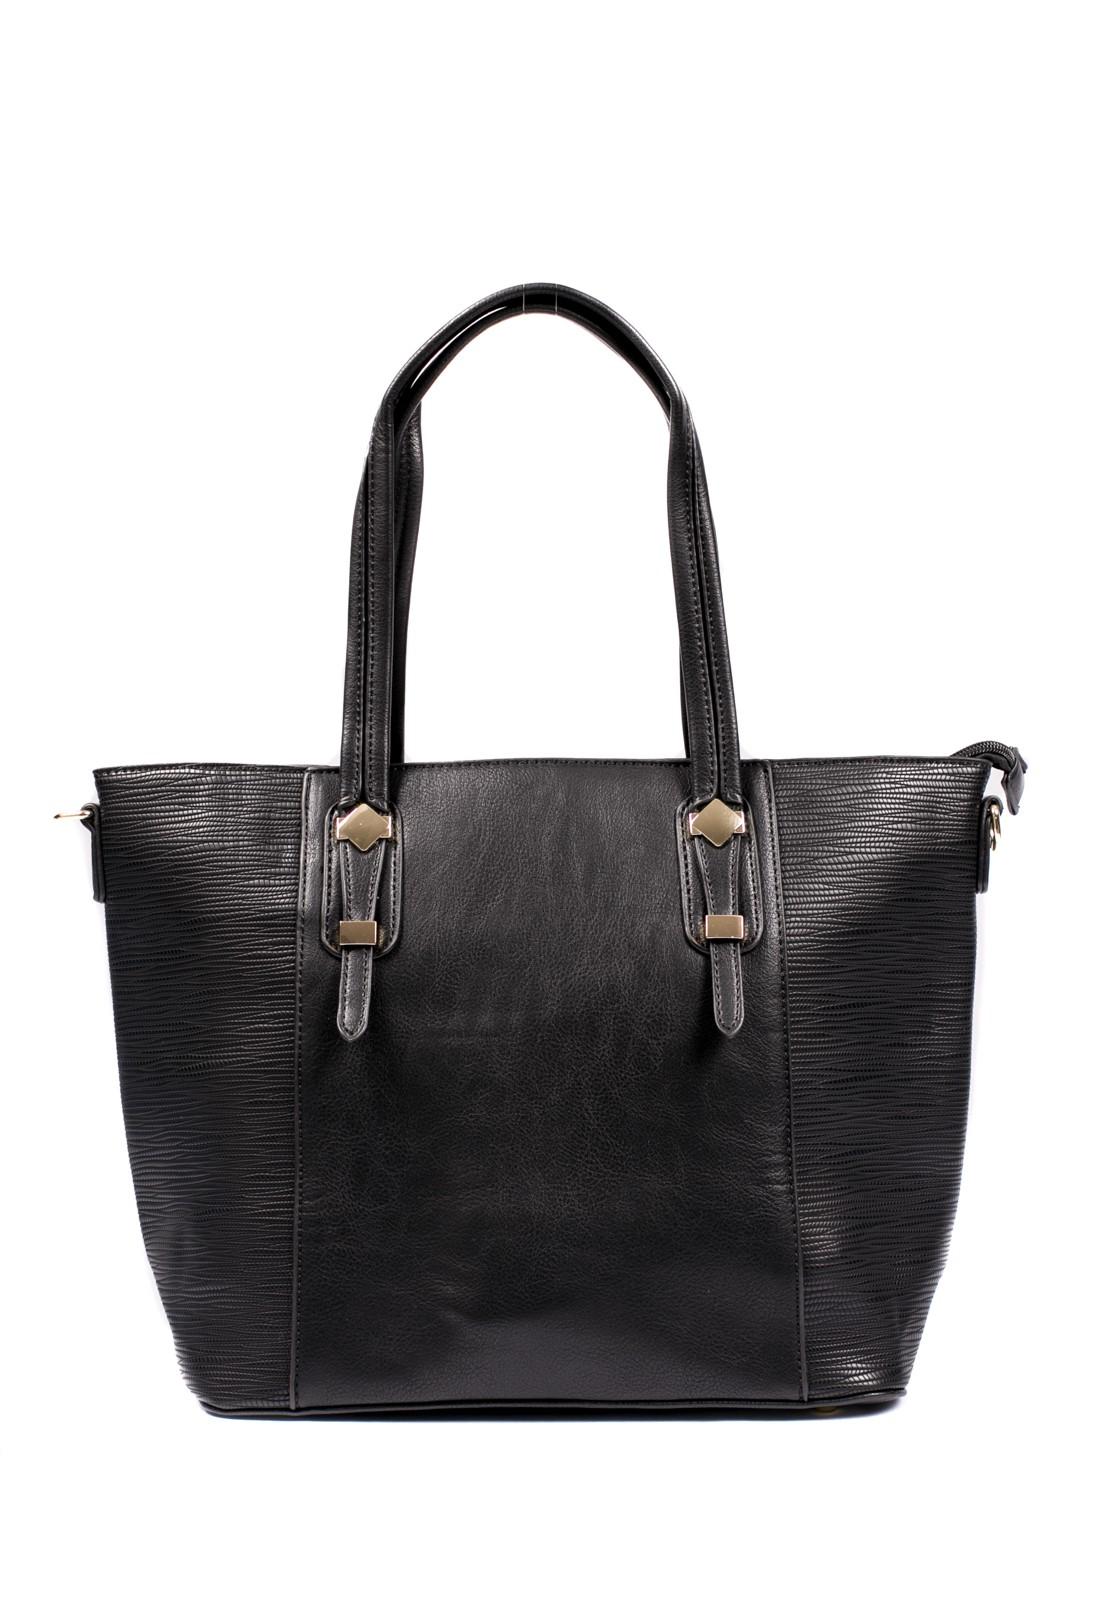 Bolsa Shopping Feminina Couro Sintético Texturizado Alça Transversal Preta